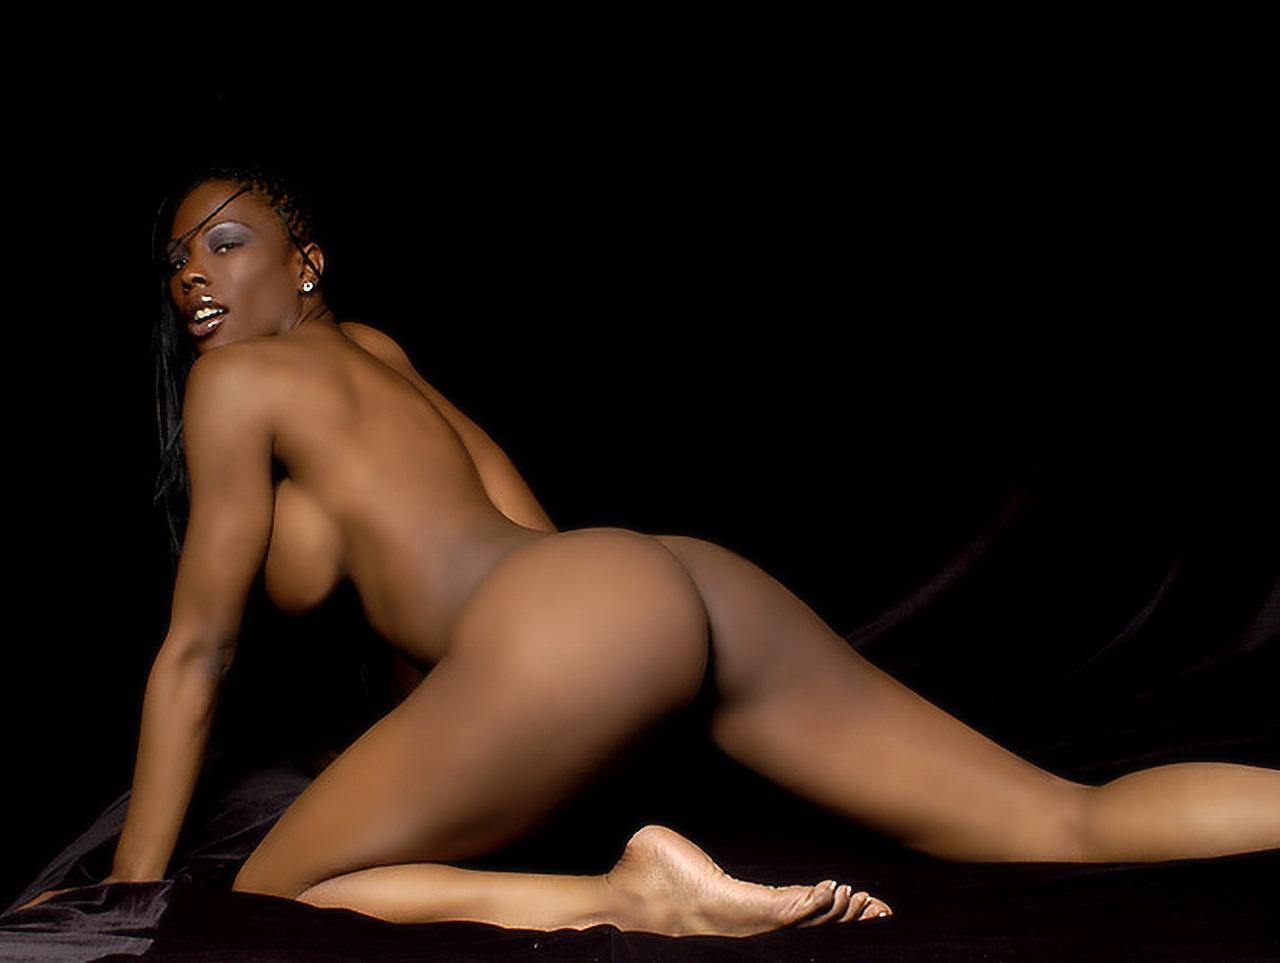 Nude ebony sport models - Porn